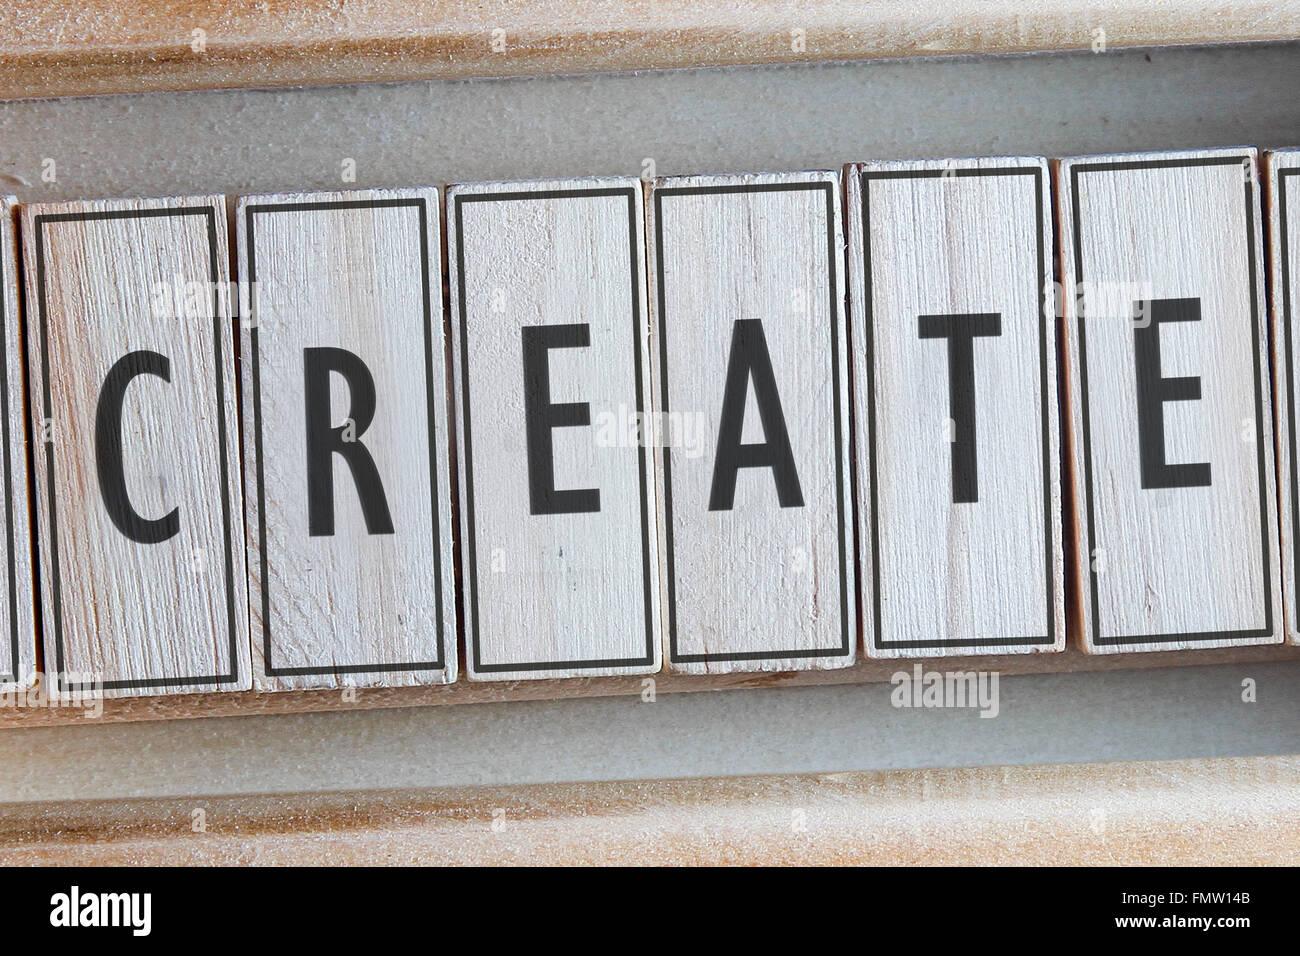 Create word written on wood - Stock Image